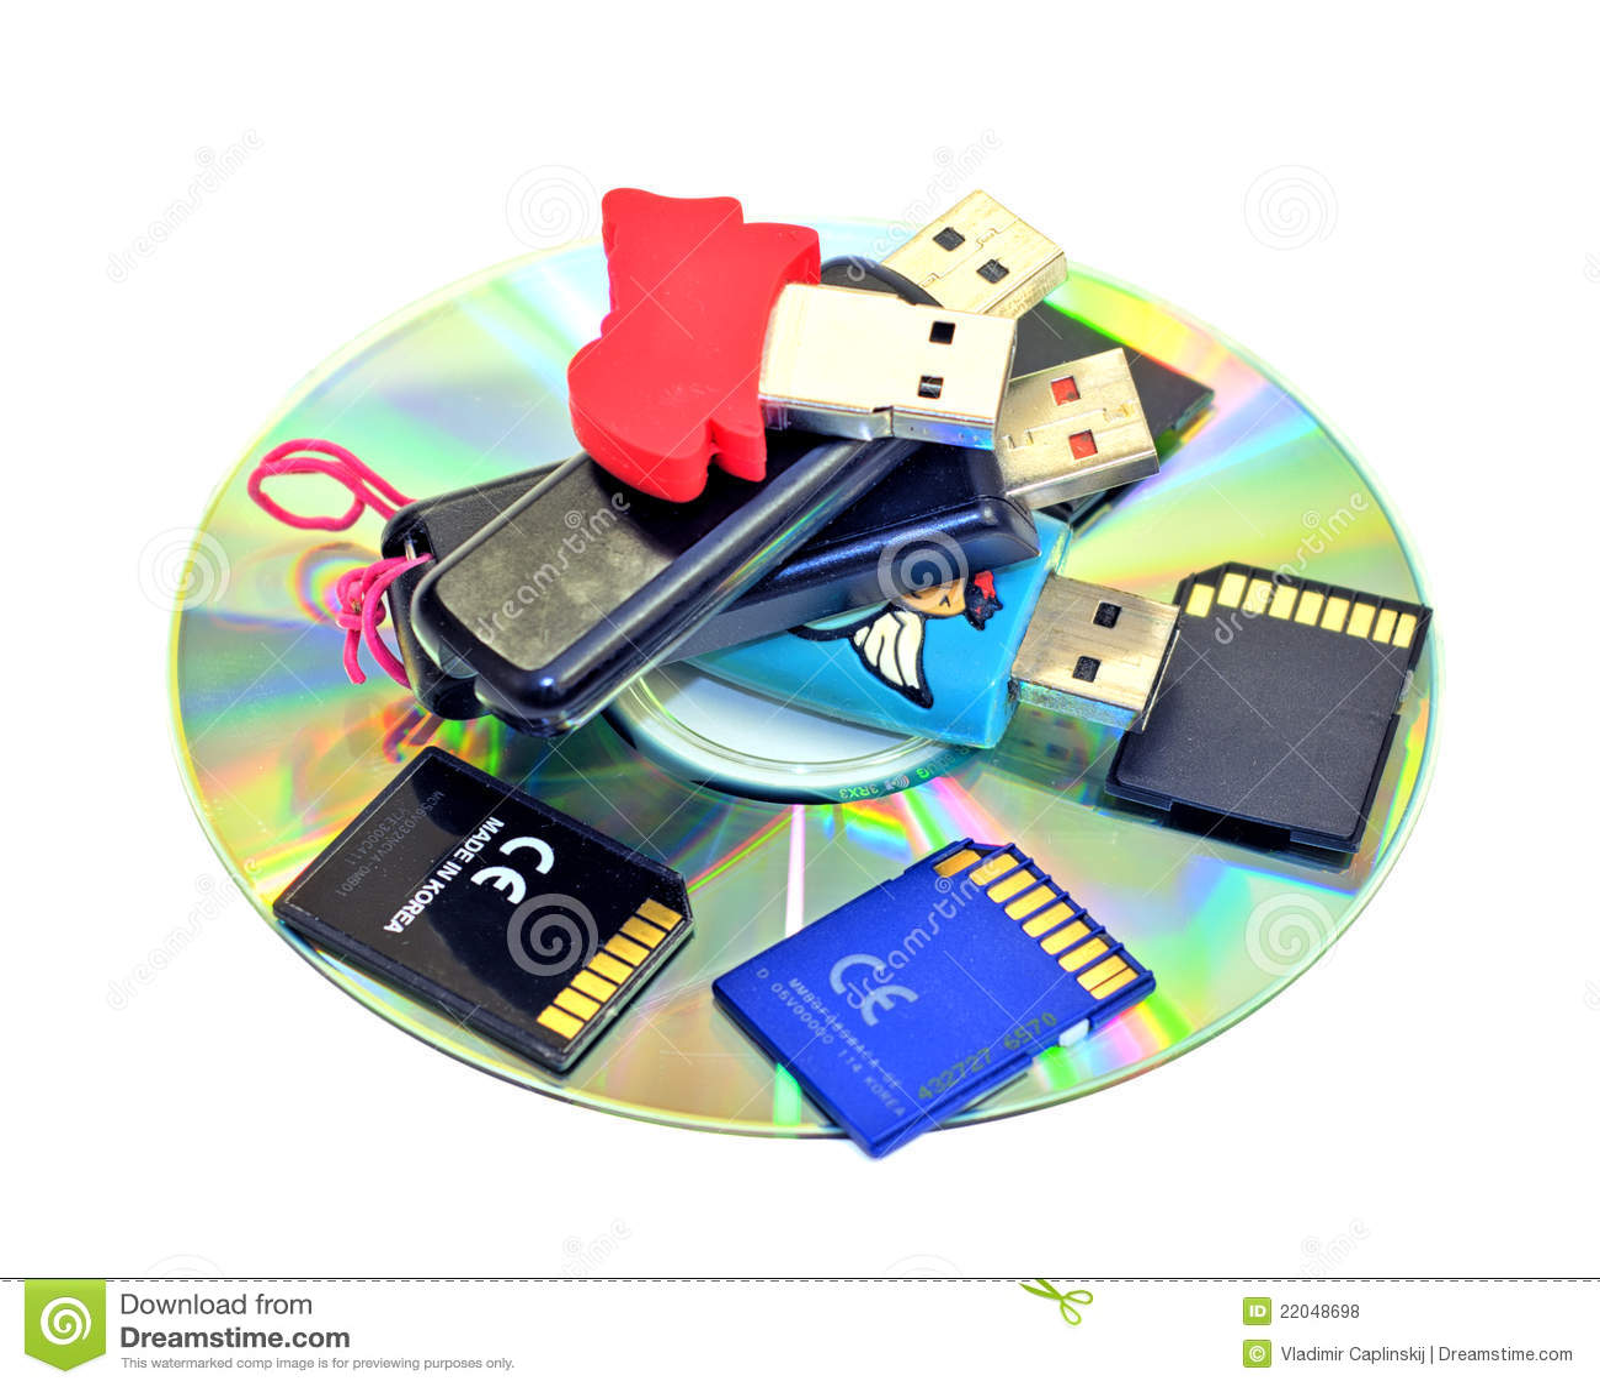 Usb Flash Drives Sd Cards Cdrom Stock Photo Image